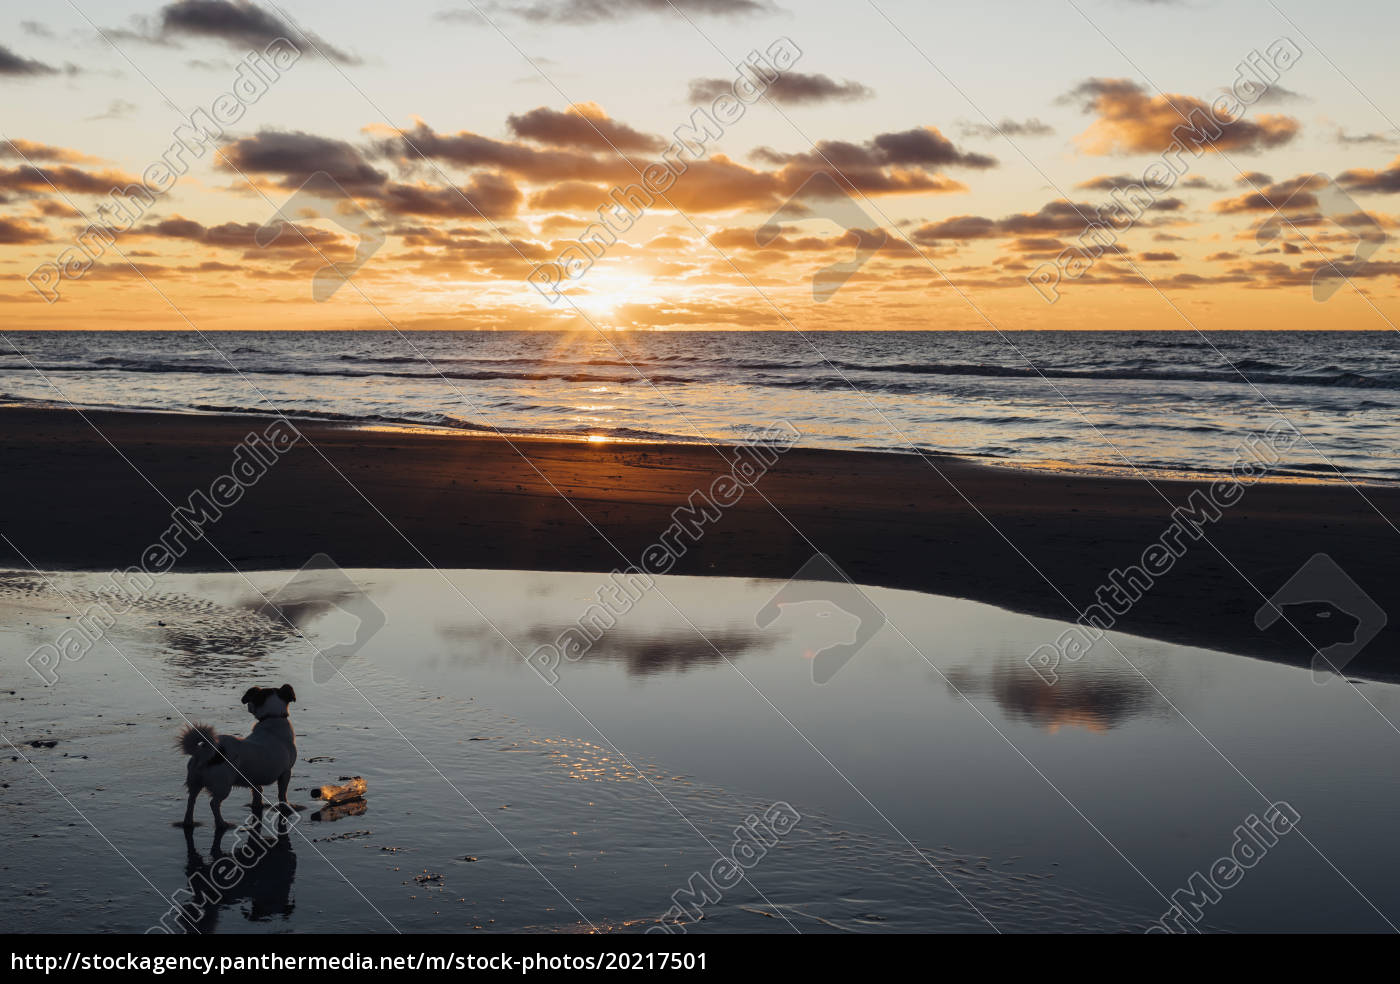 dänemark, nordjütland, hund, am, ruhigen, strand, bei, sonnenuntergang - 20217501